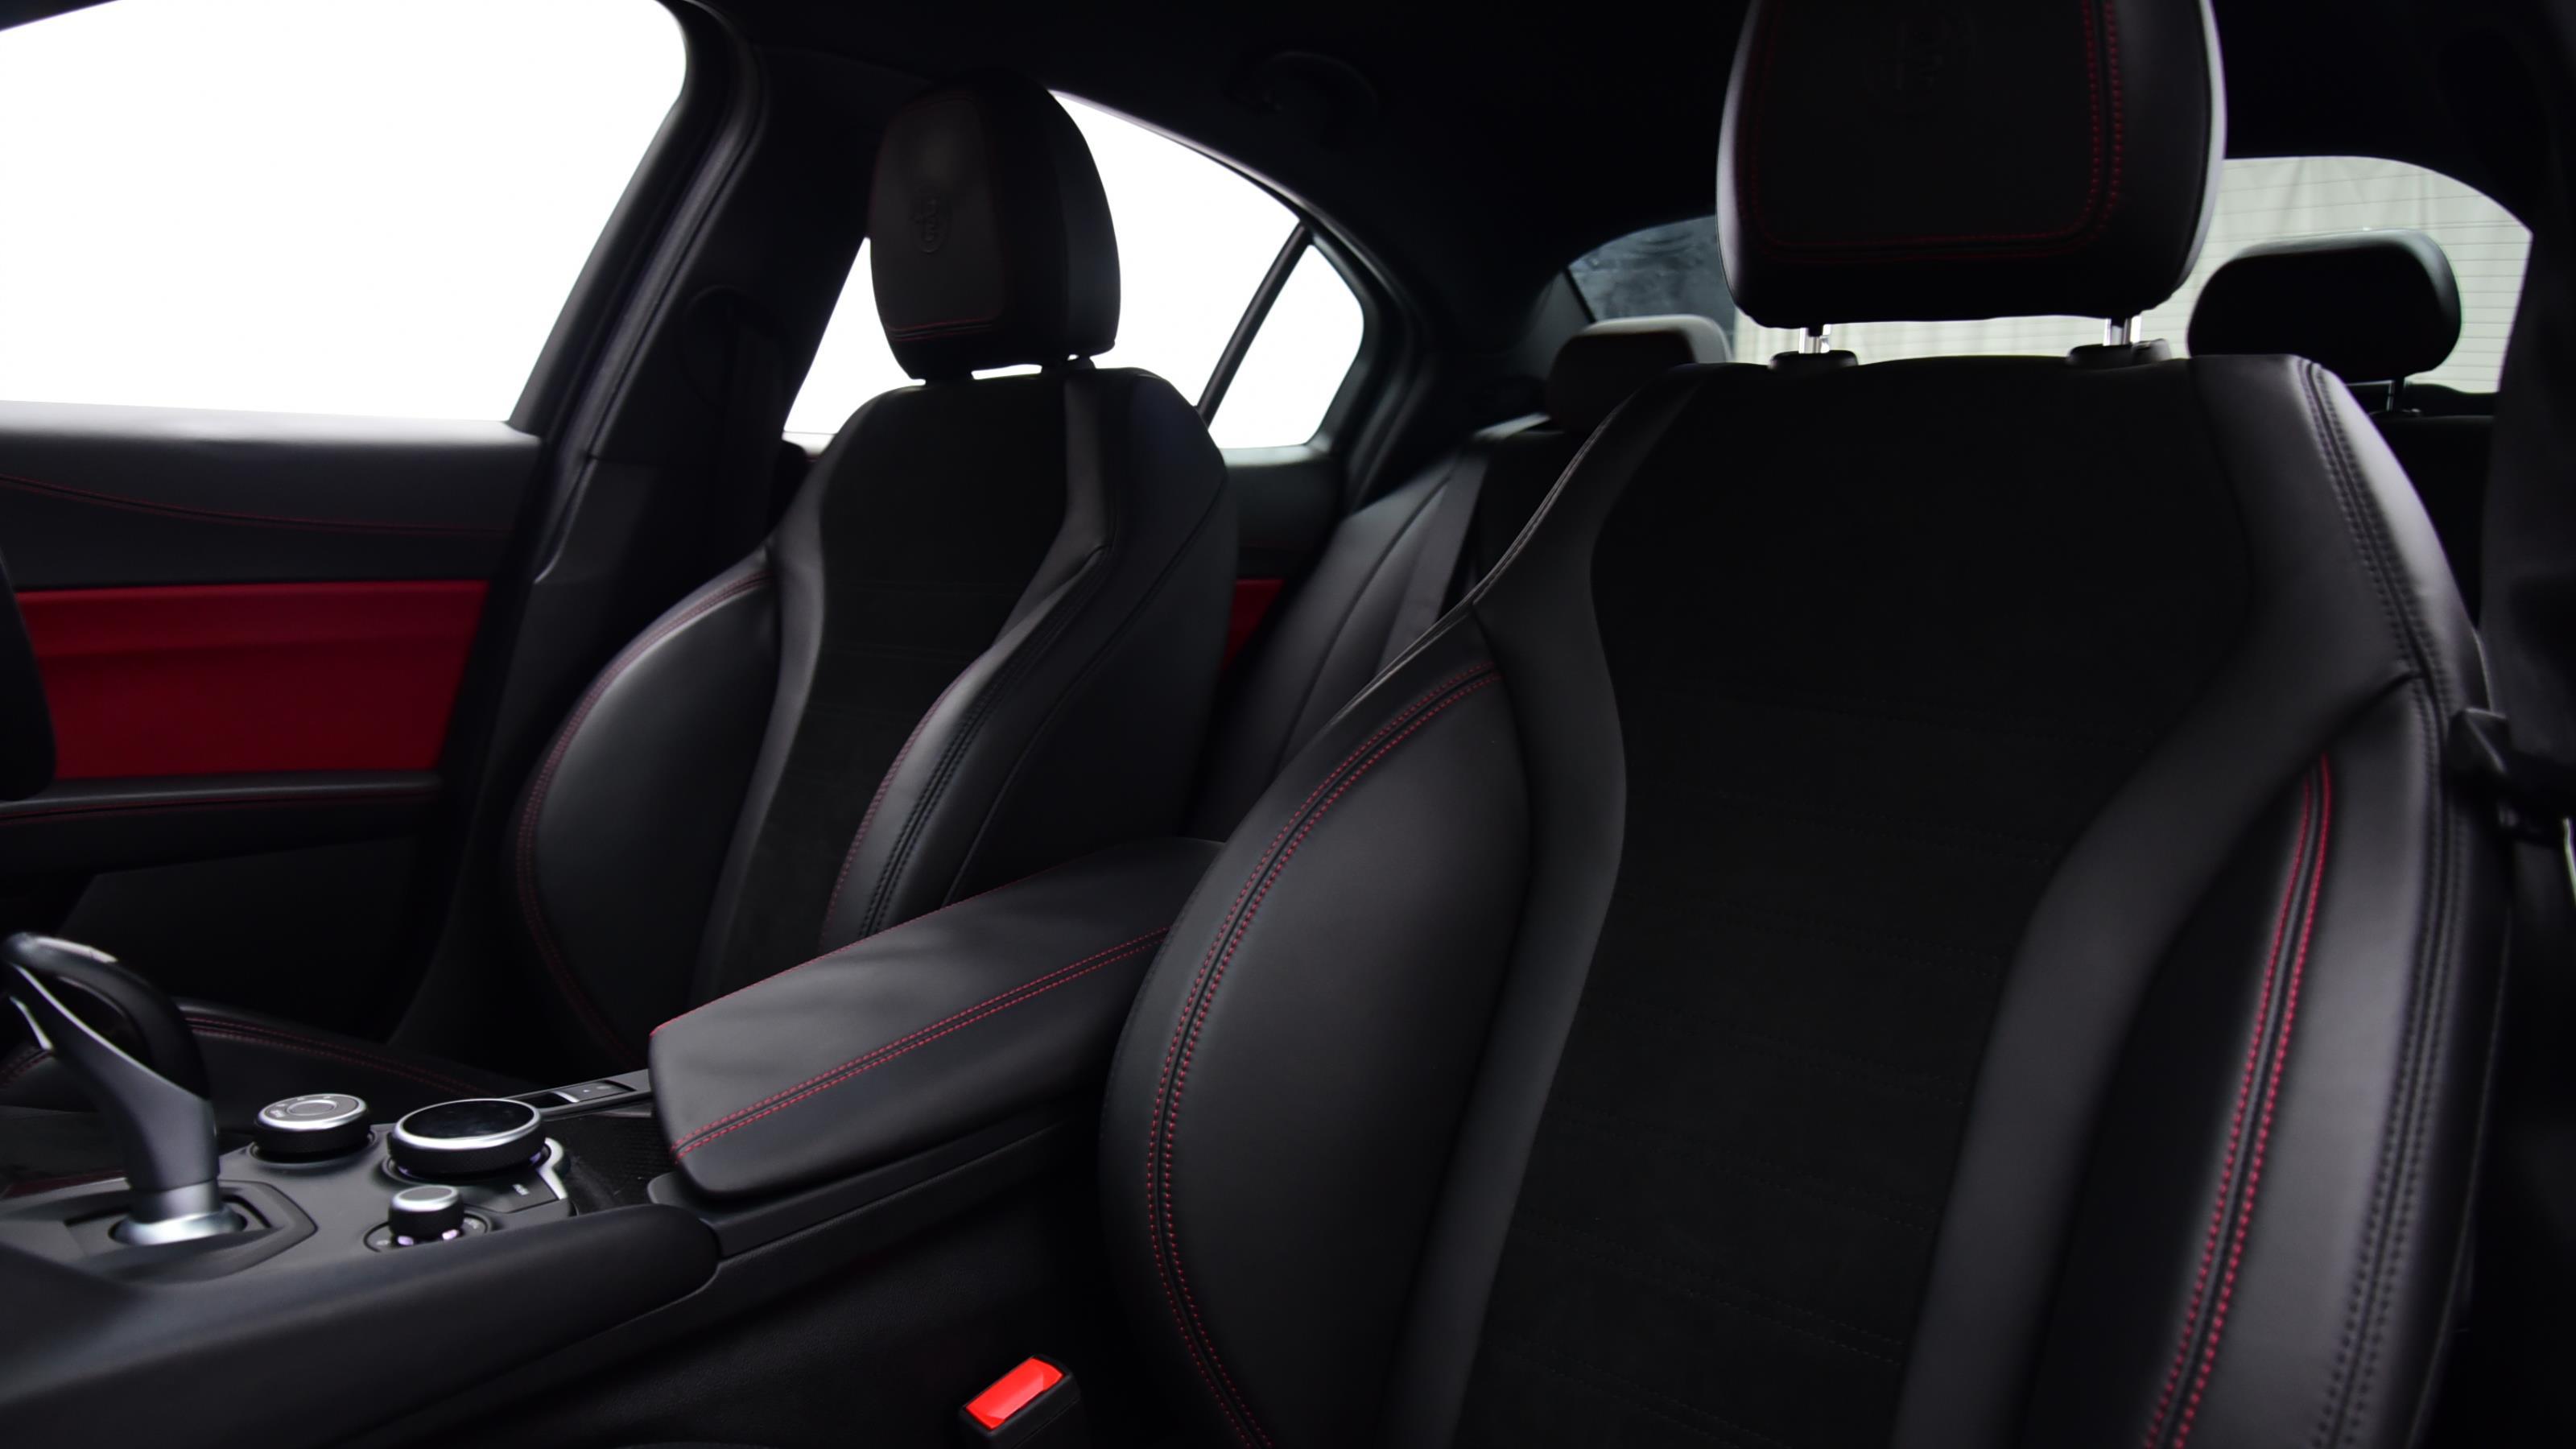 Used 2017 Alfa Romeo GIULIA 2.9 V6 BiTurbo Quadrifoglio 4dr Auto RED at Saxton4x4